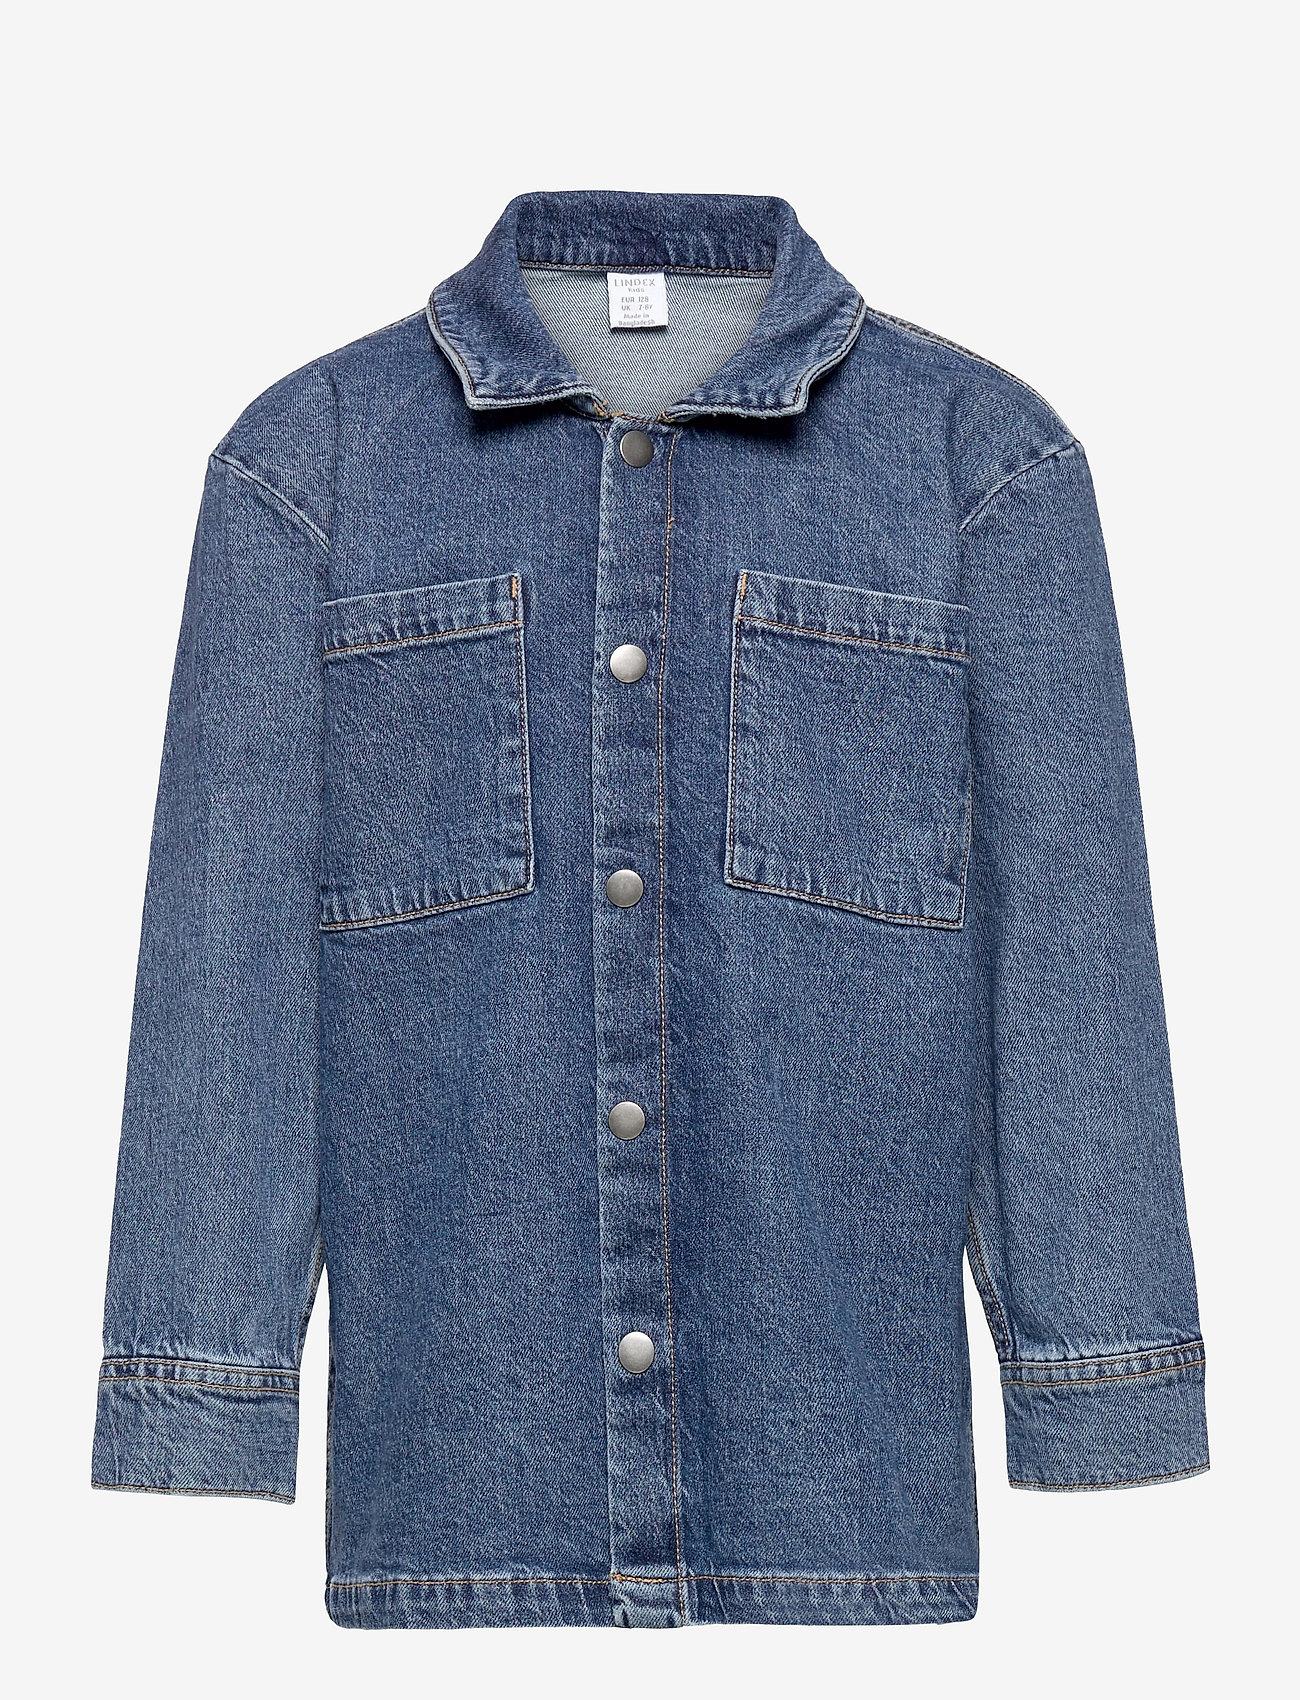 Lindex - Shirt overshirt denim - spijkerjassen - blue - 0